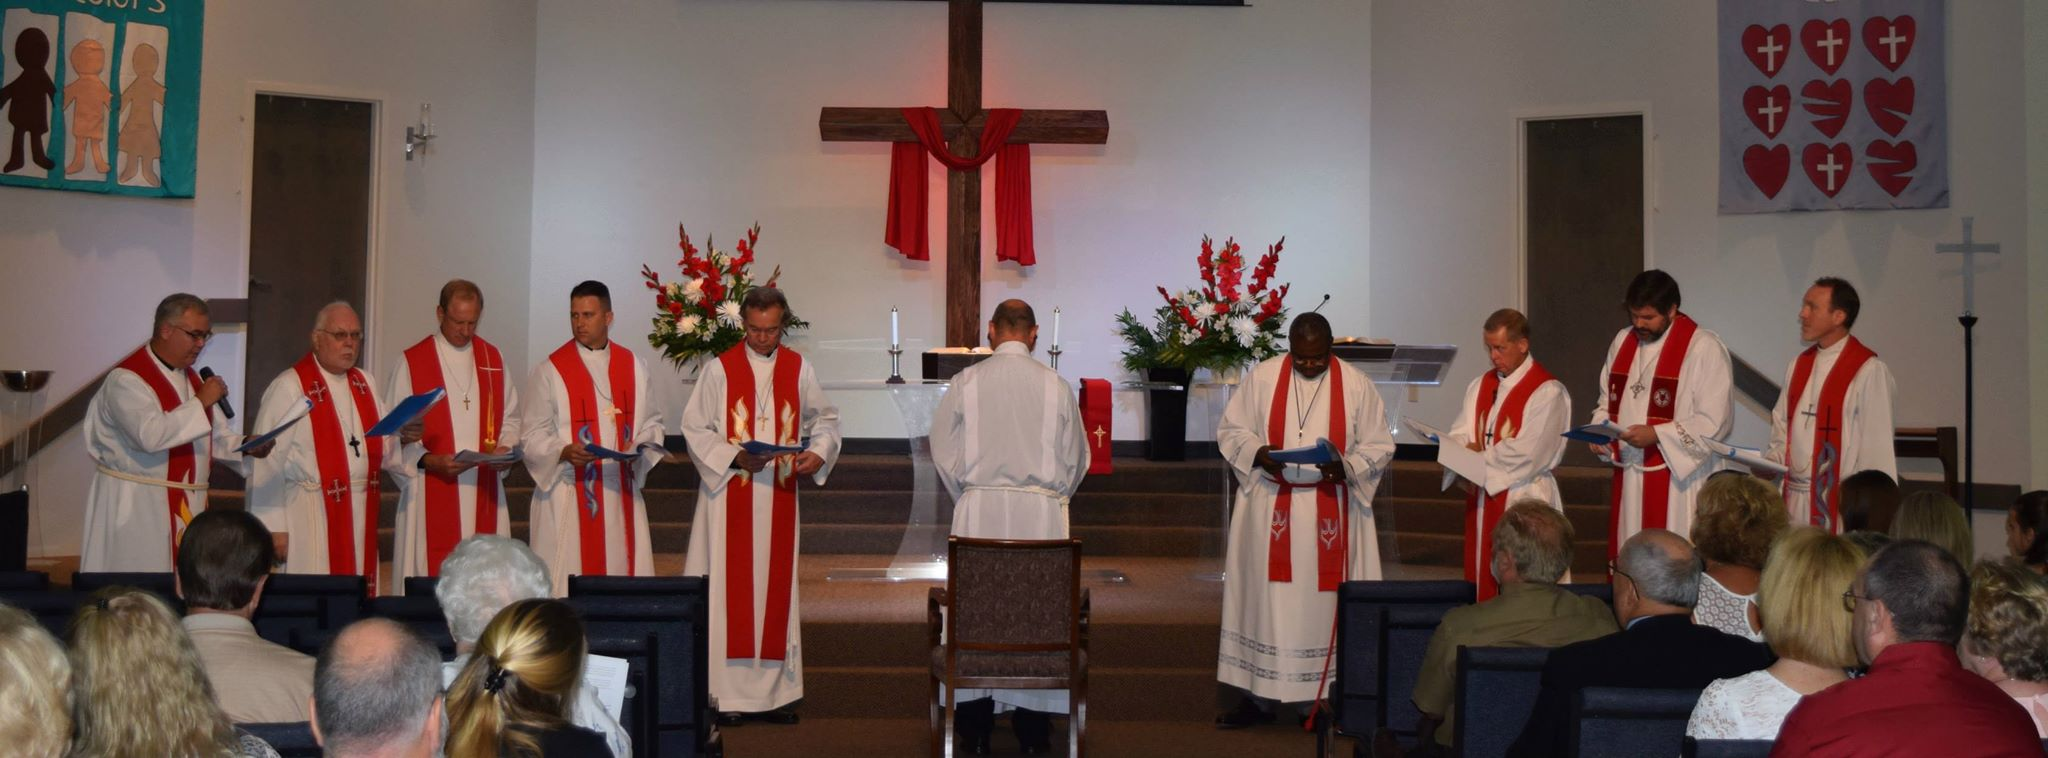 Ordination Service.jpg